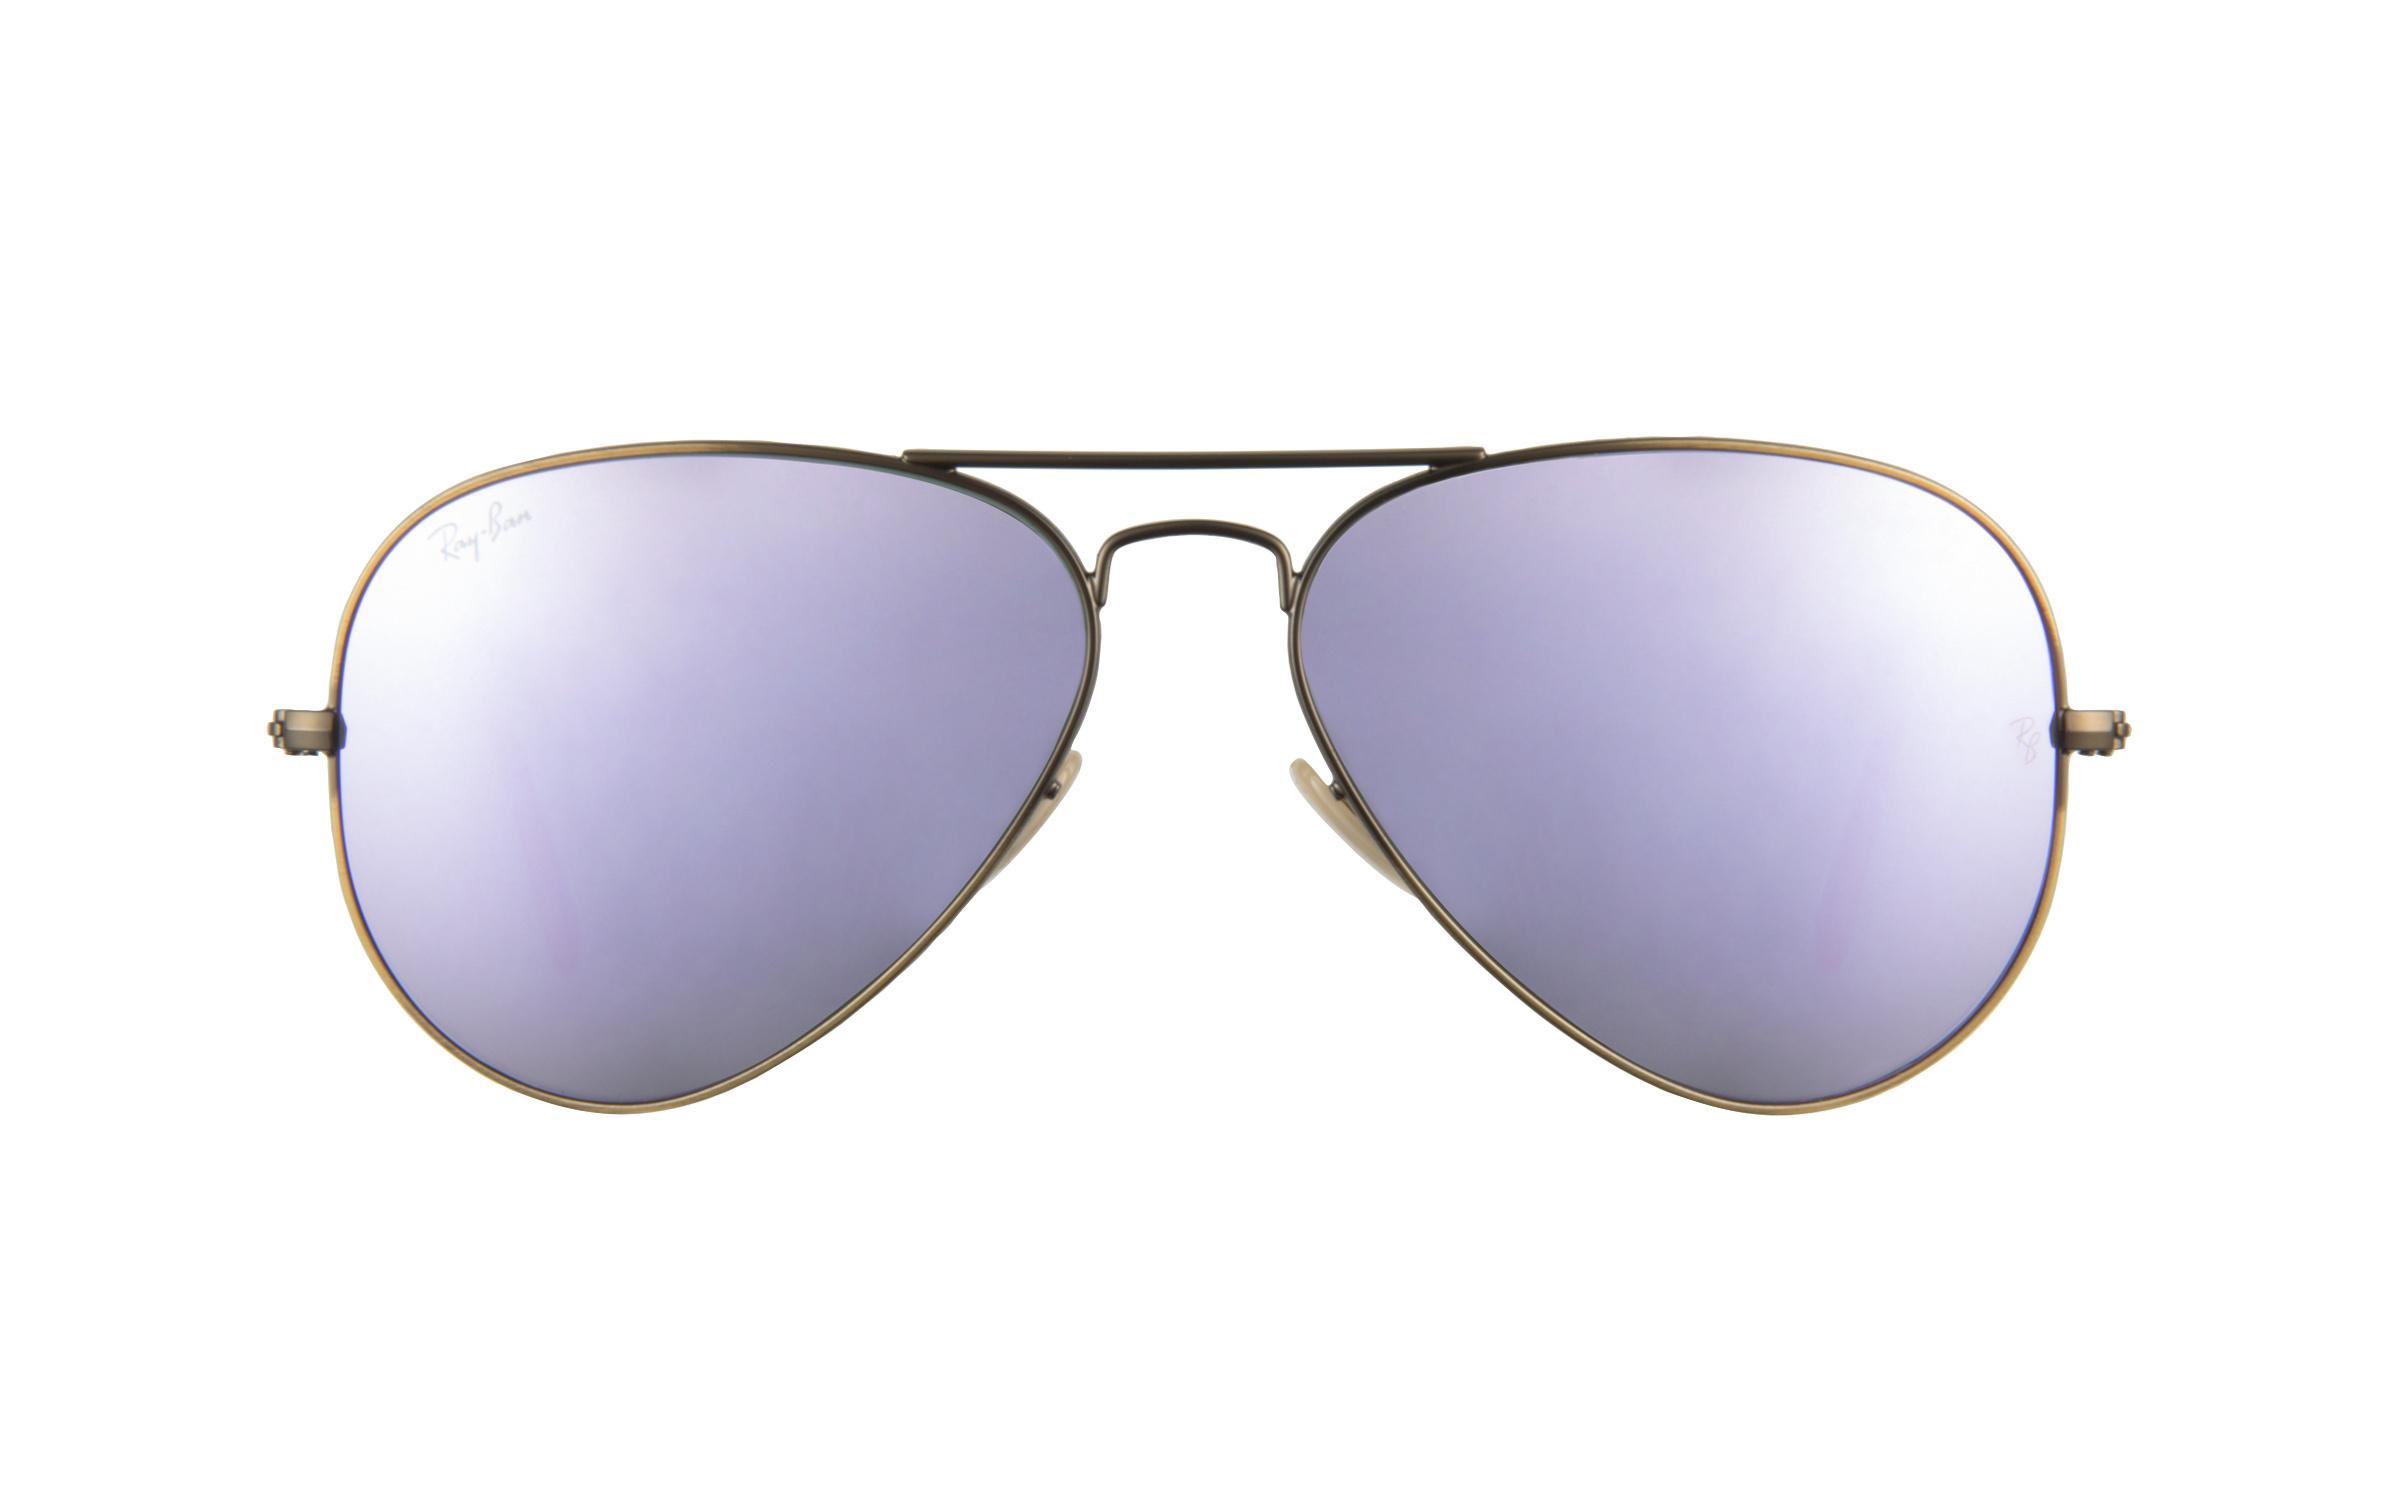 Ray-Ban 3025 167 4K Lilac Mirror 58 Sunglasses